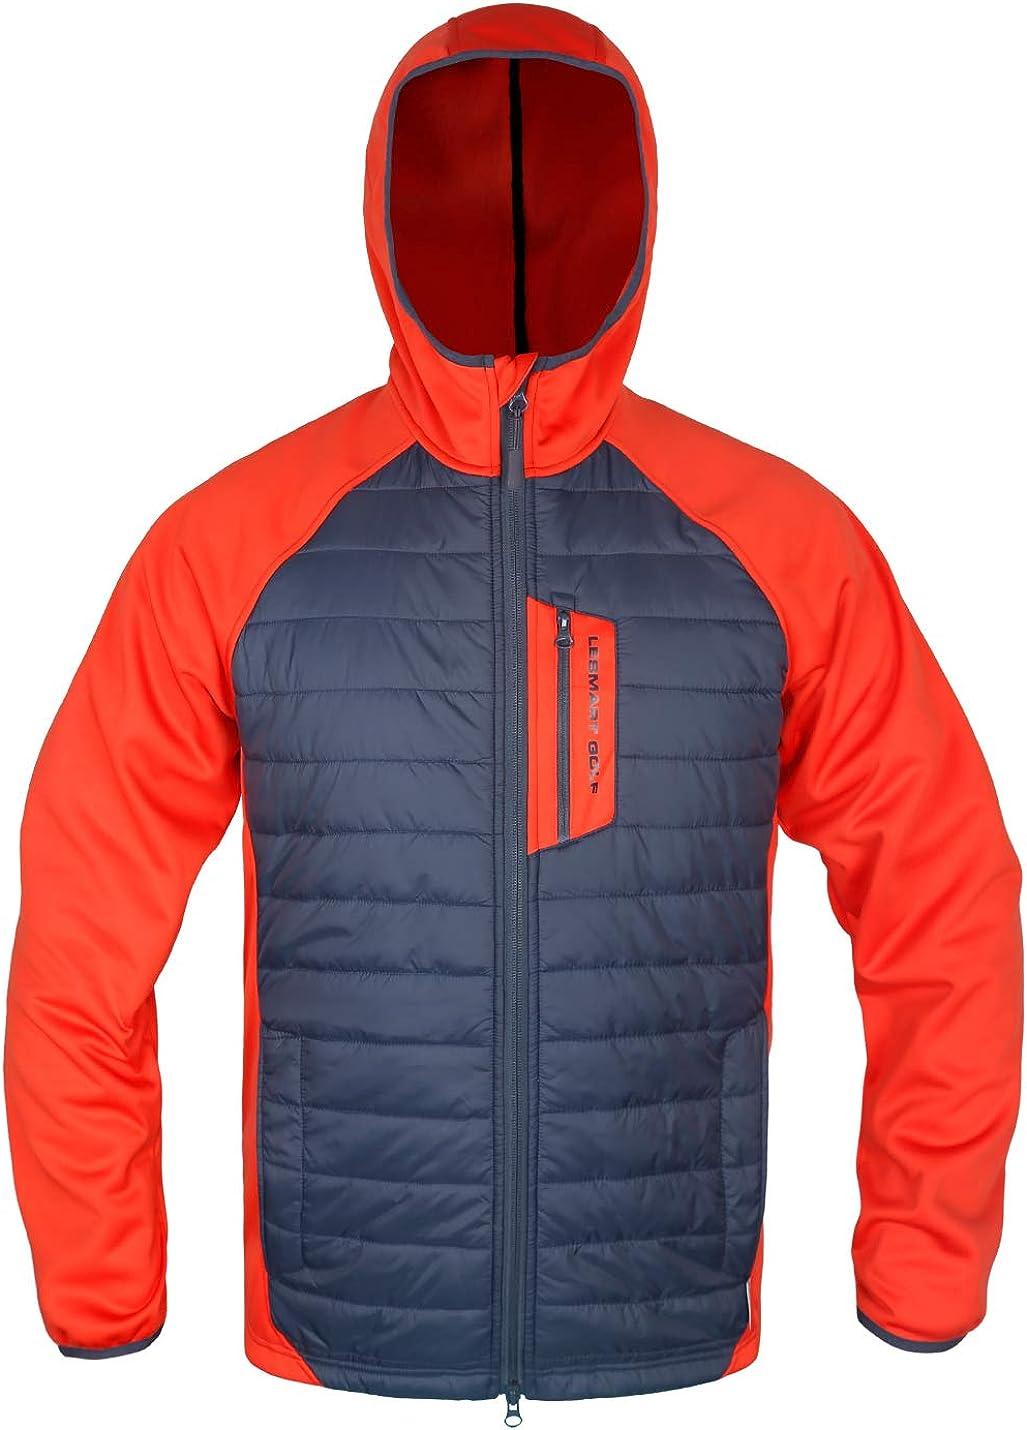 Men's Hybrid Jacket Quilted Lightweight Hooded Insulated Weatherproof Outwear Warm Jacket